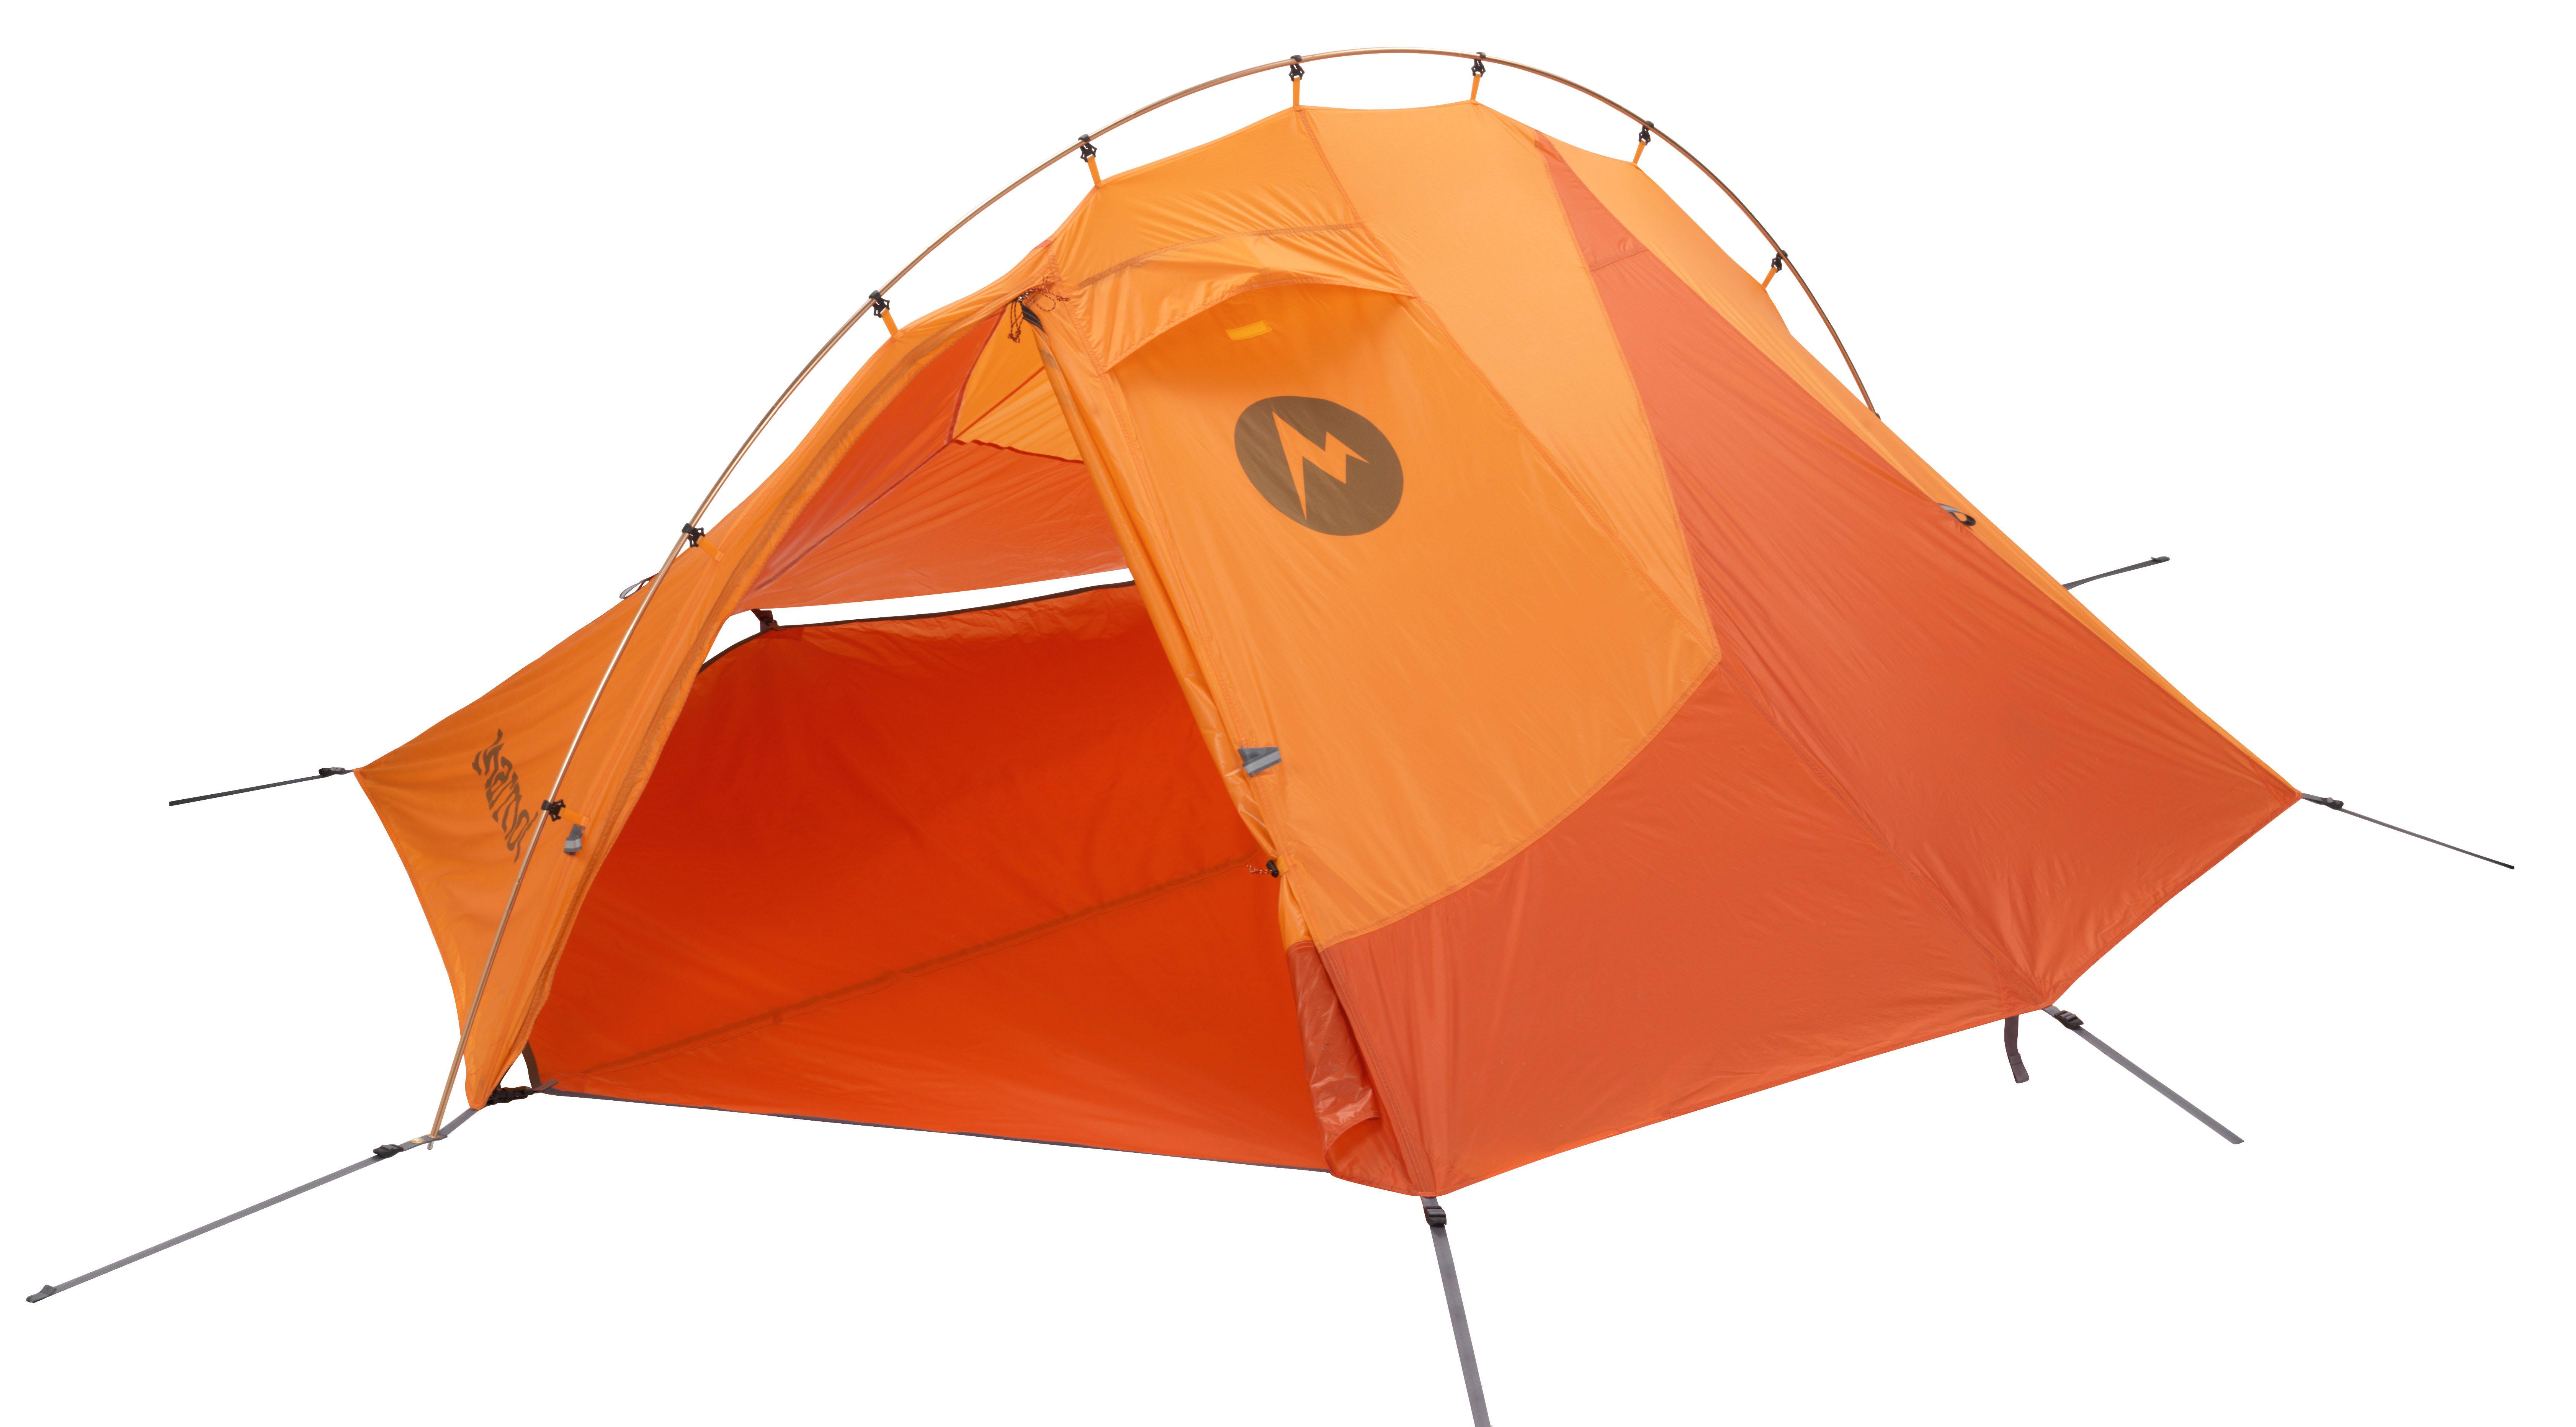 Marmot Haven 2 Person Tent Pumpkin  sc 1 st  PopScreen & Marmot Haven 2 Person Tent Pumpkin on PopScreen